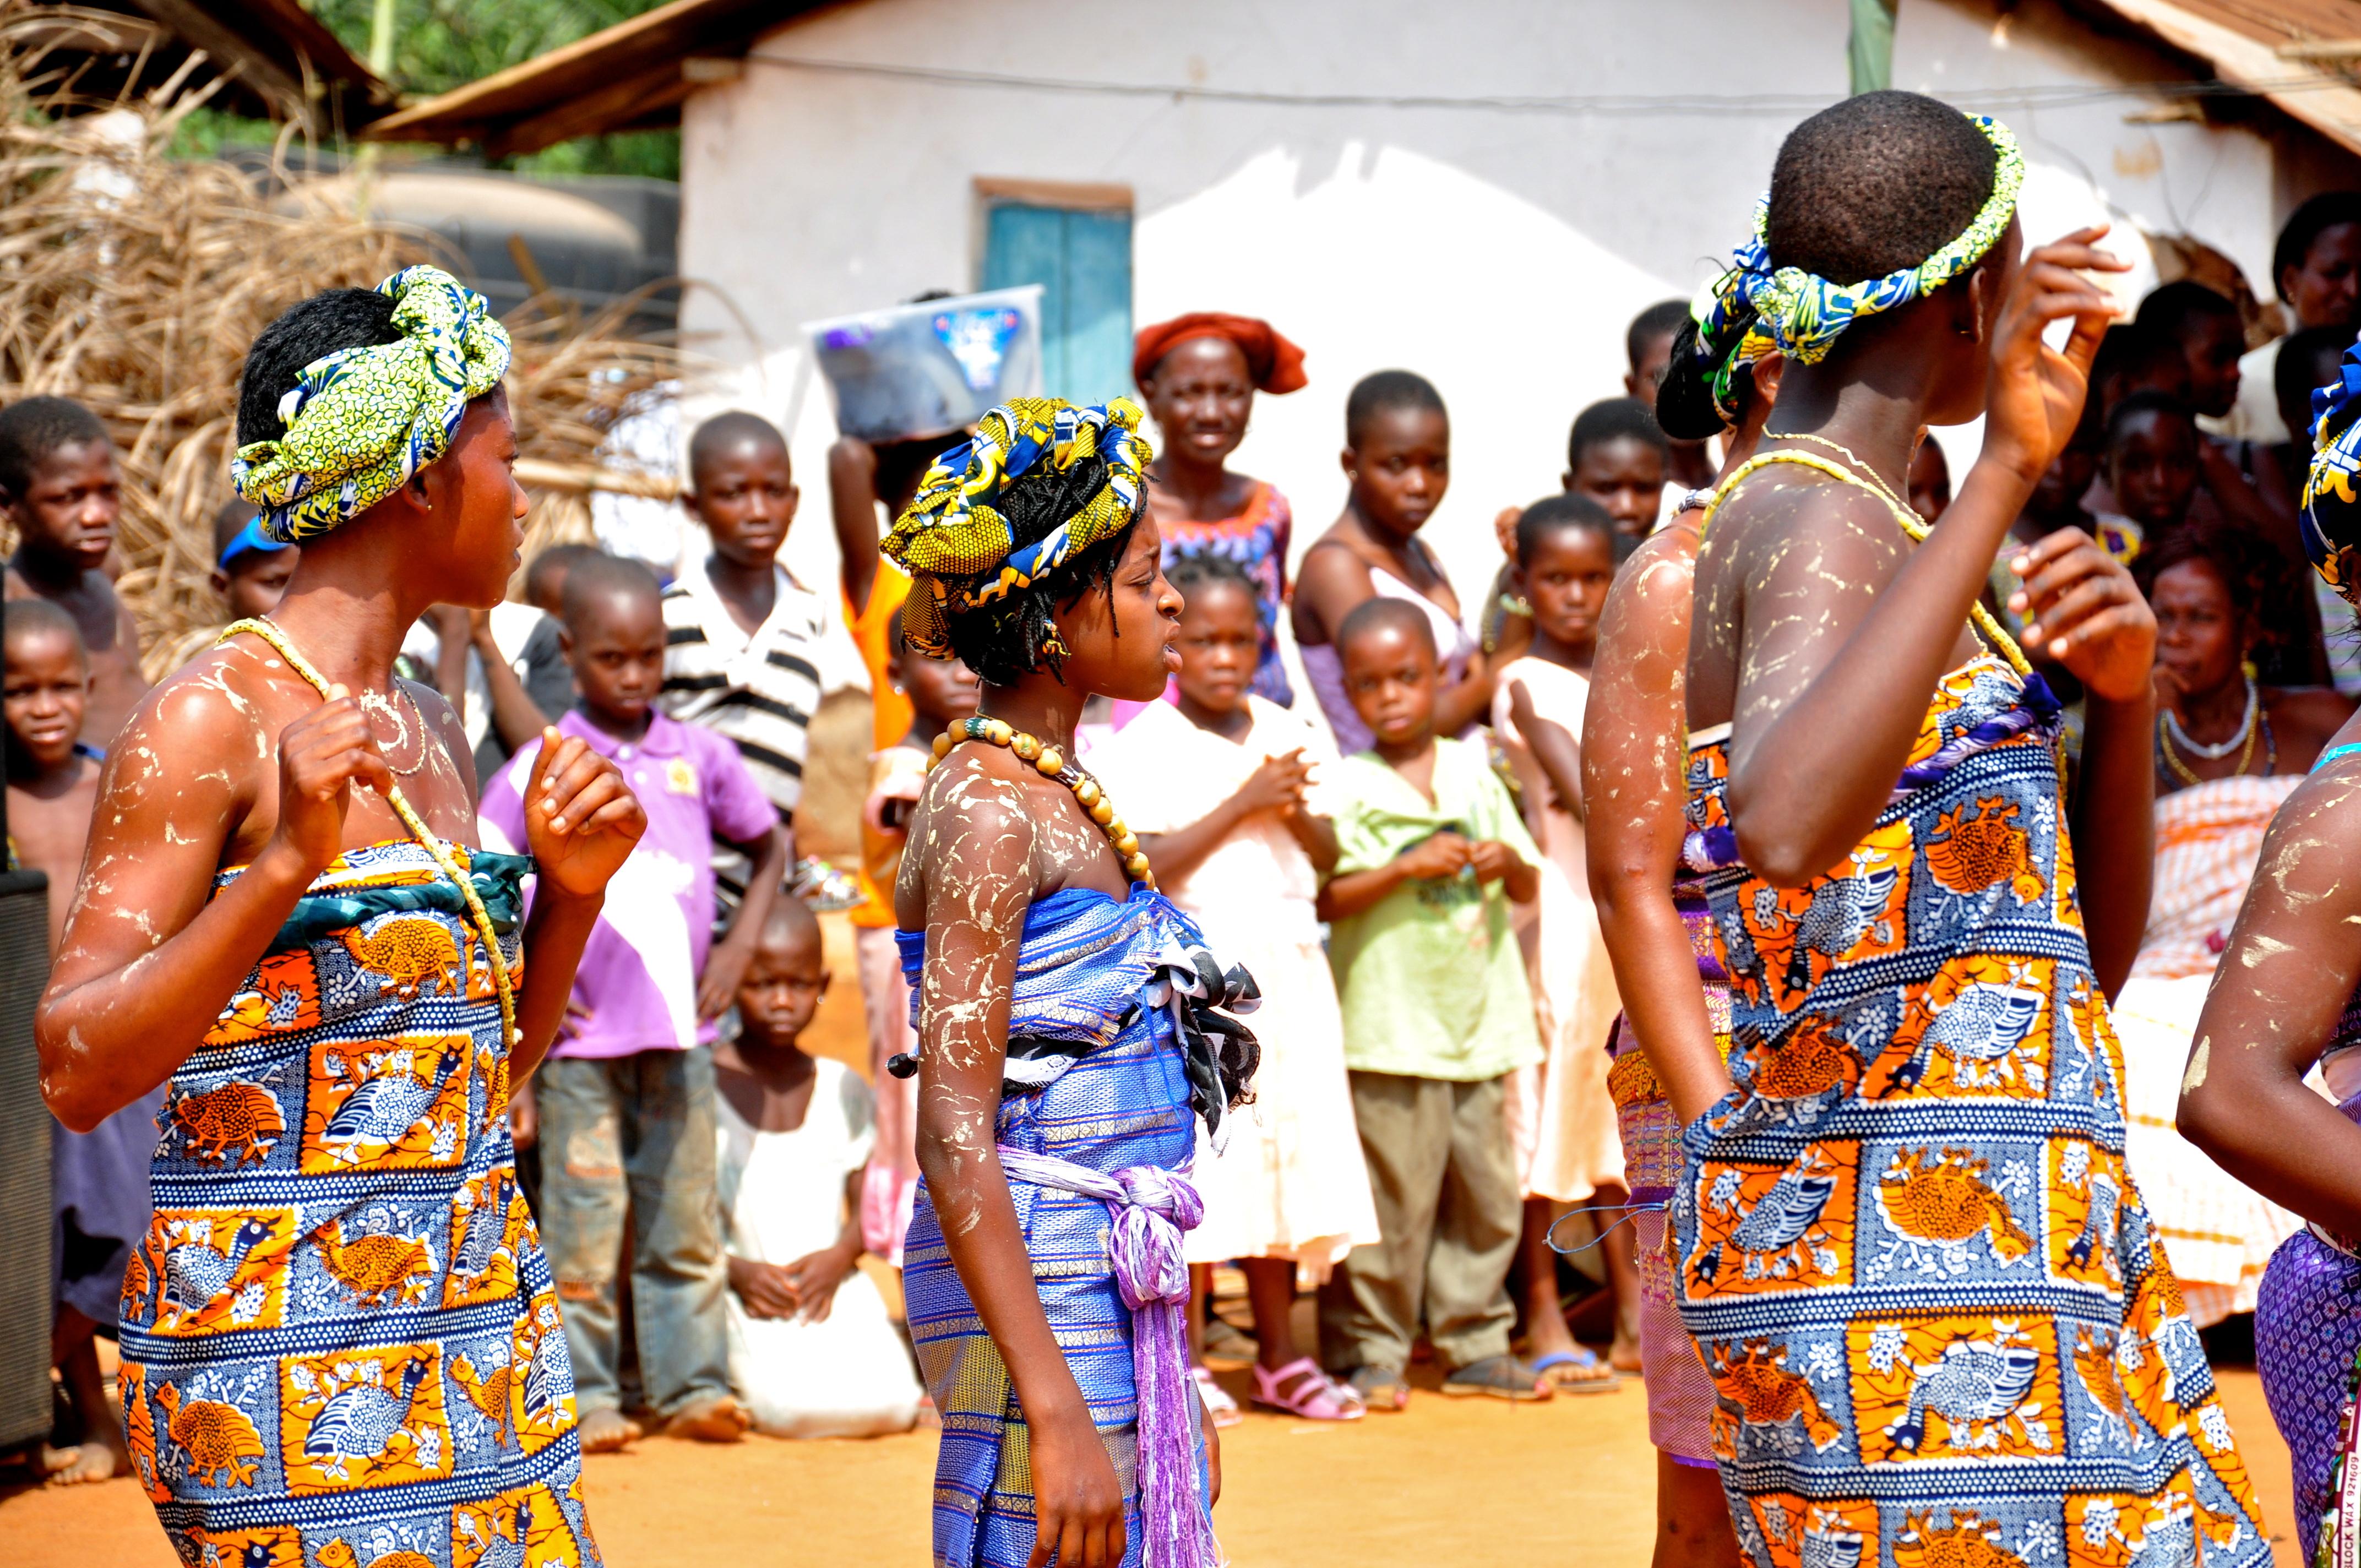 Pictures Of Ghana Women Club Dancing 67